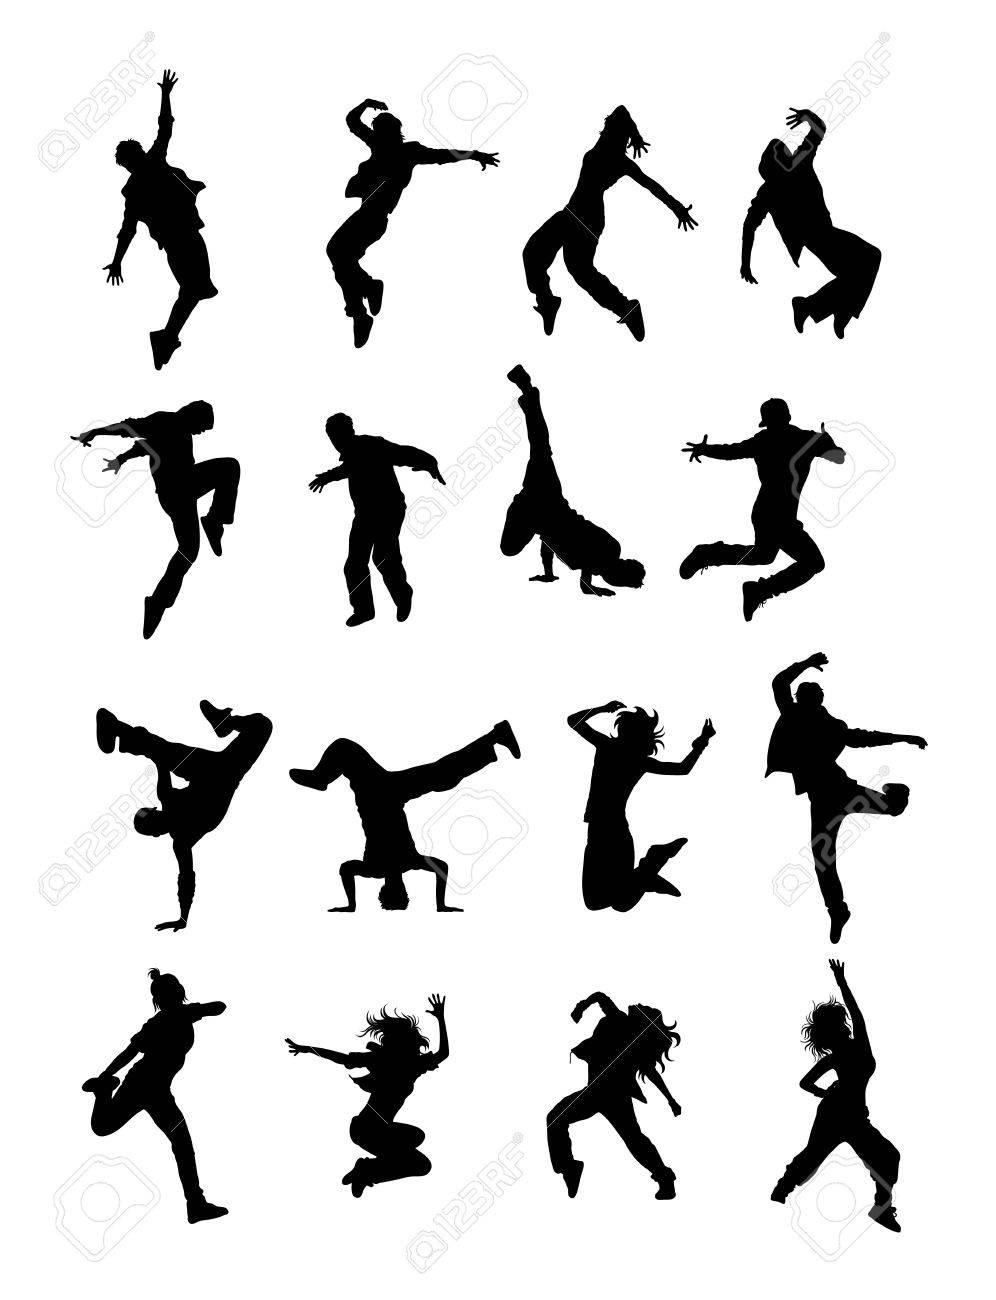 Hip Hop Modern Dancers Silhouettes - 59095767